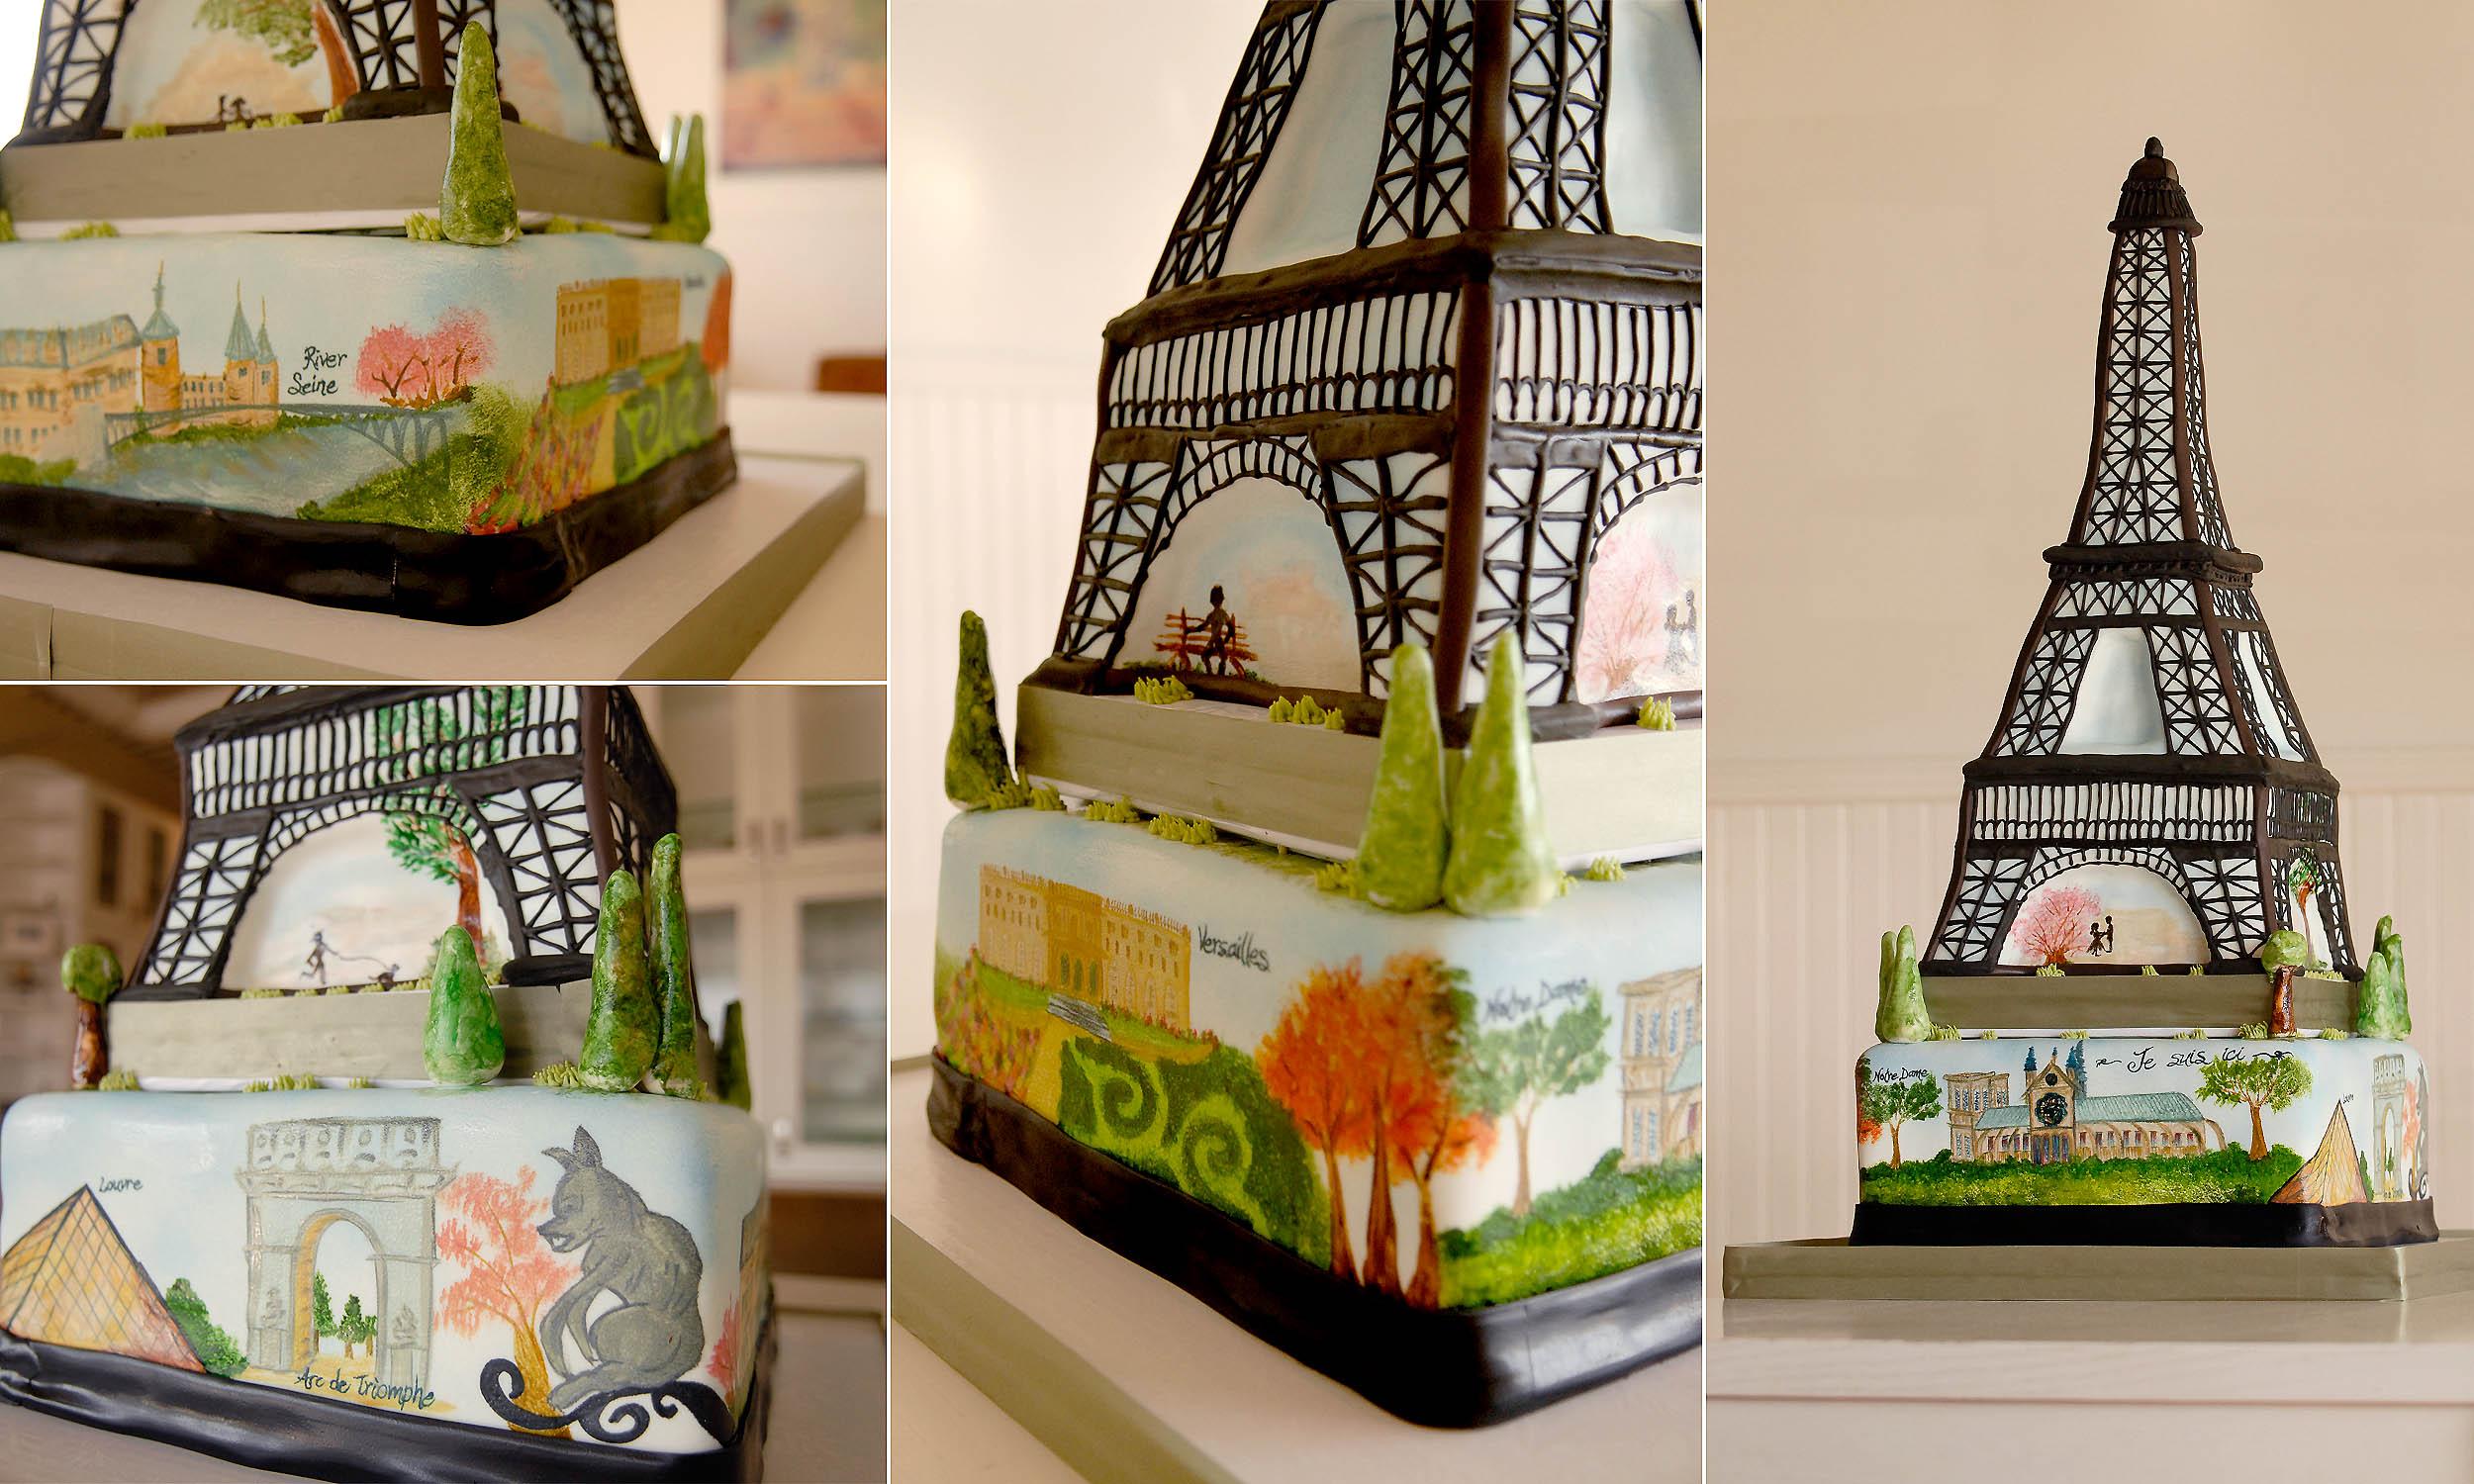 sculpted_cake_gallery_004.jpg